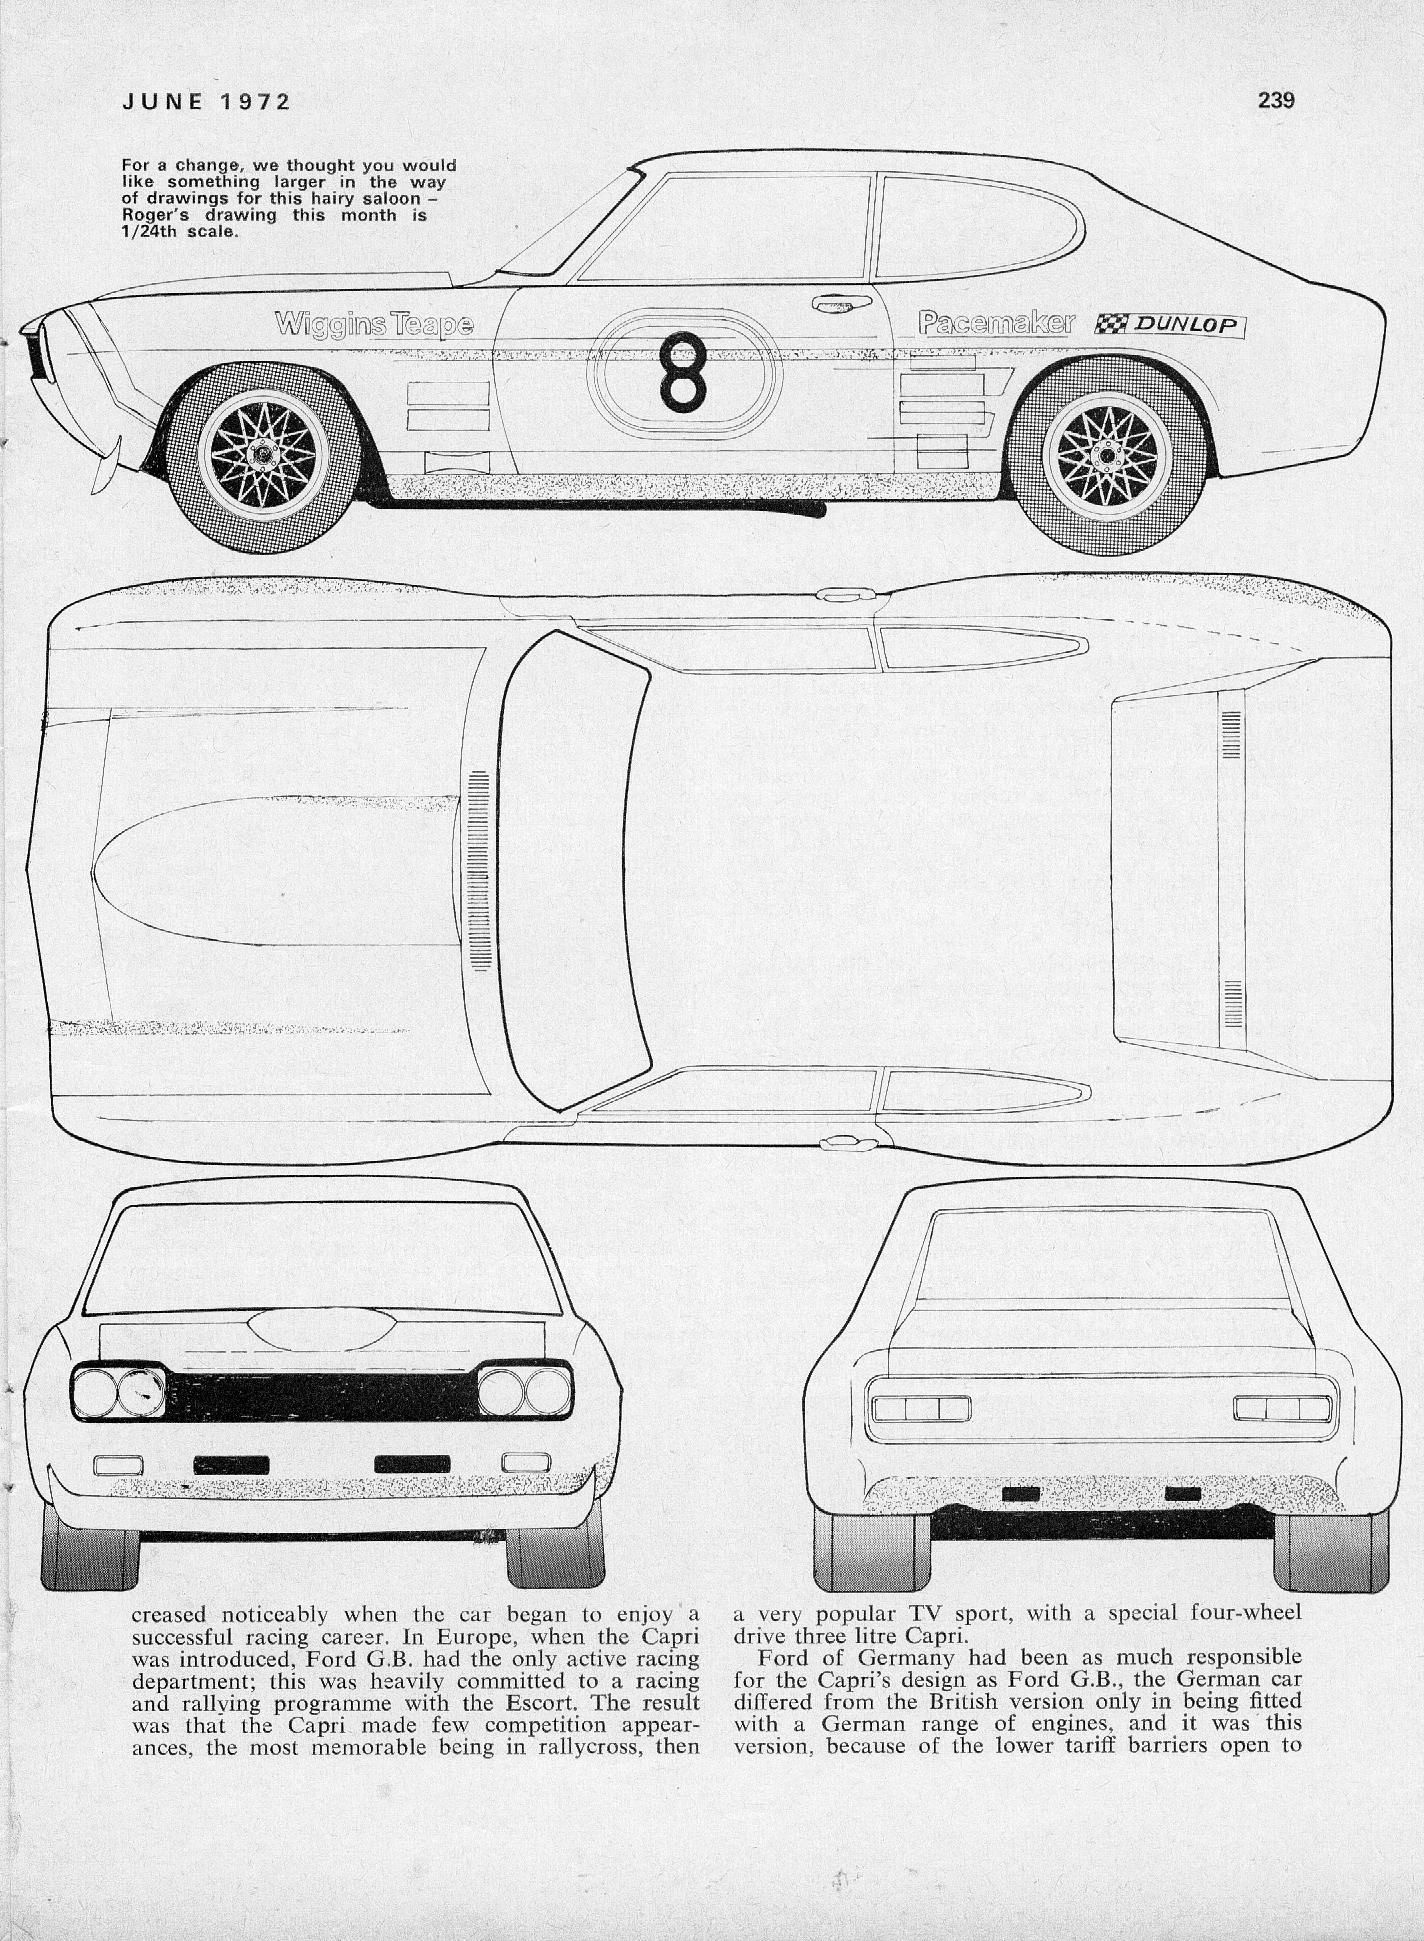 Ford Capri 2600 RS | Racing Car blueprint | Pinterest | Dibujos ...